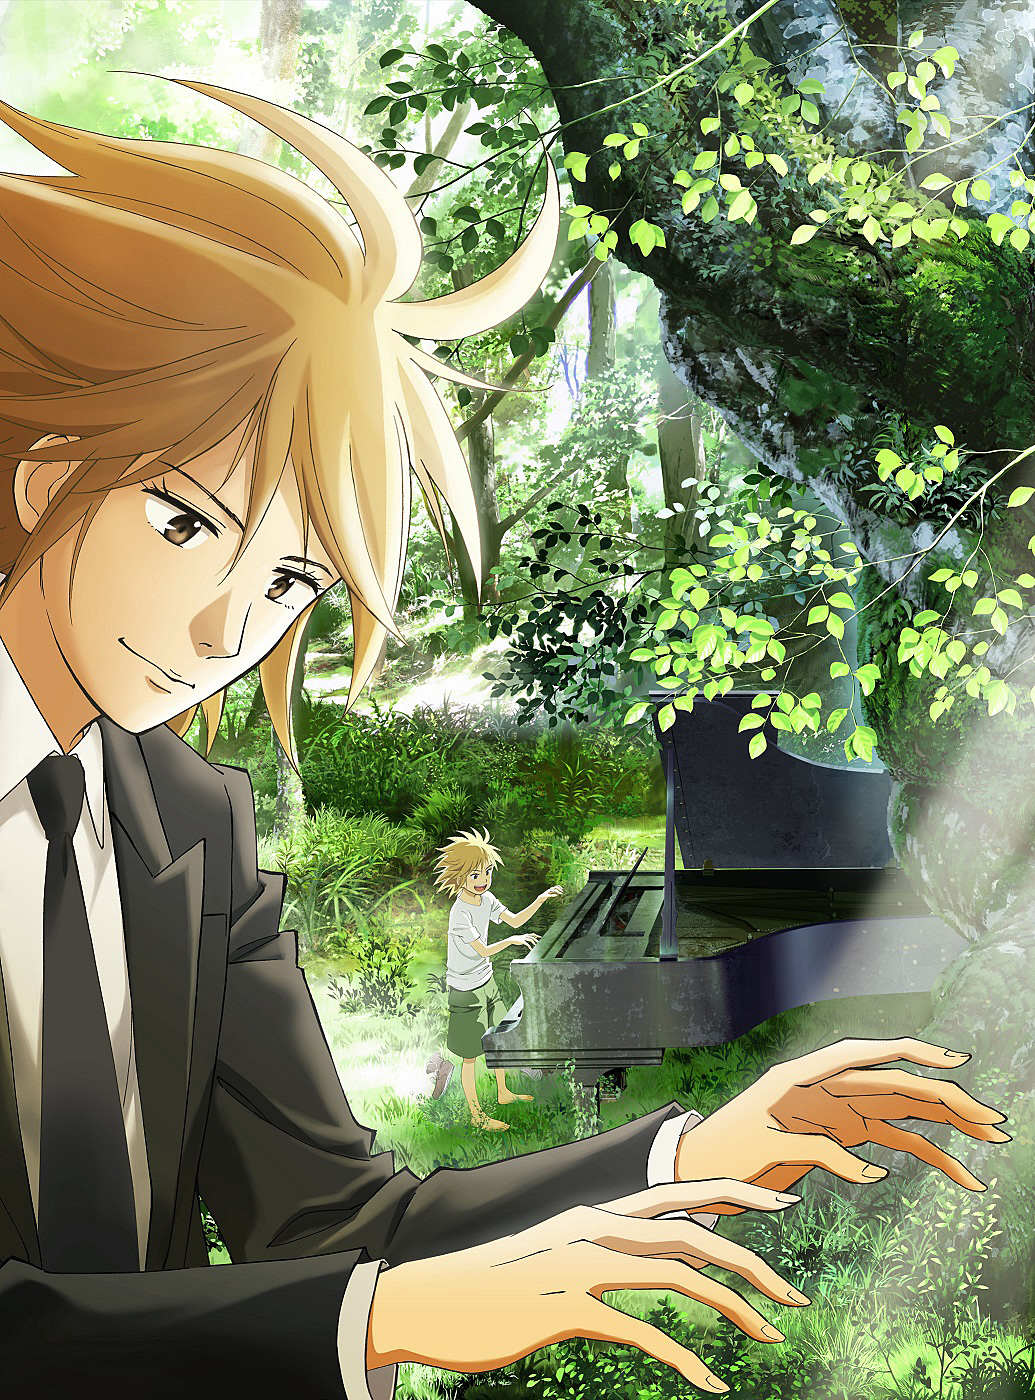 TVアニメ「ピアノの森」音楽情報...